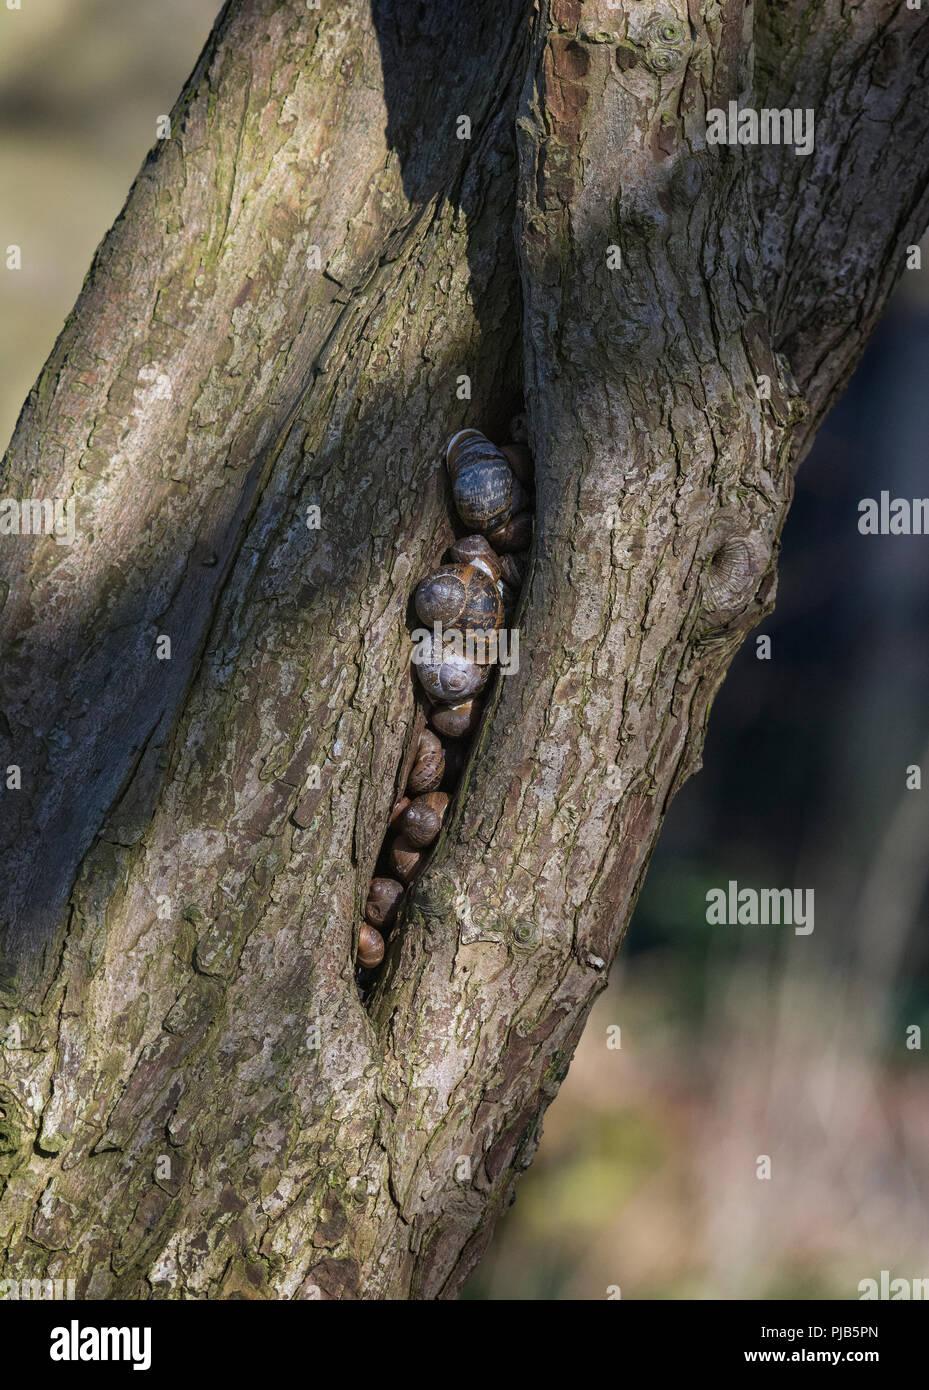 Hibernating land snails, Helix aspersa, in a crack in tree, Lancashire, UK - Stock Image